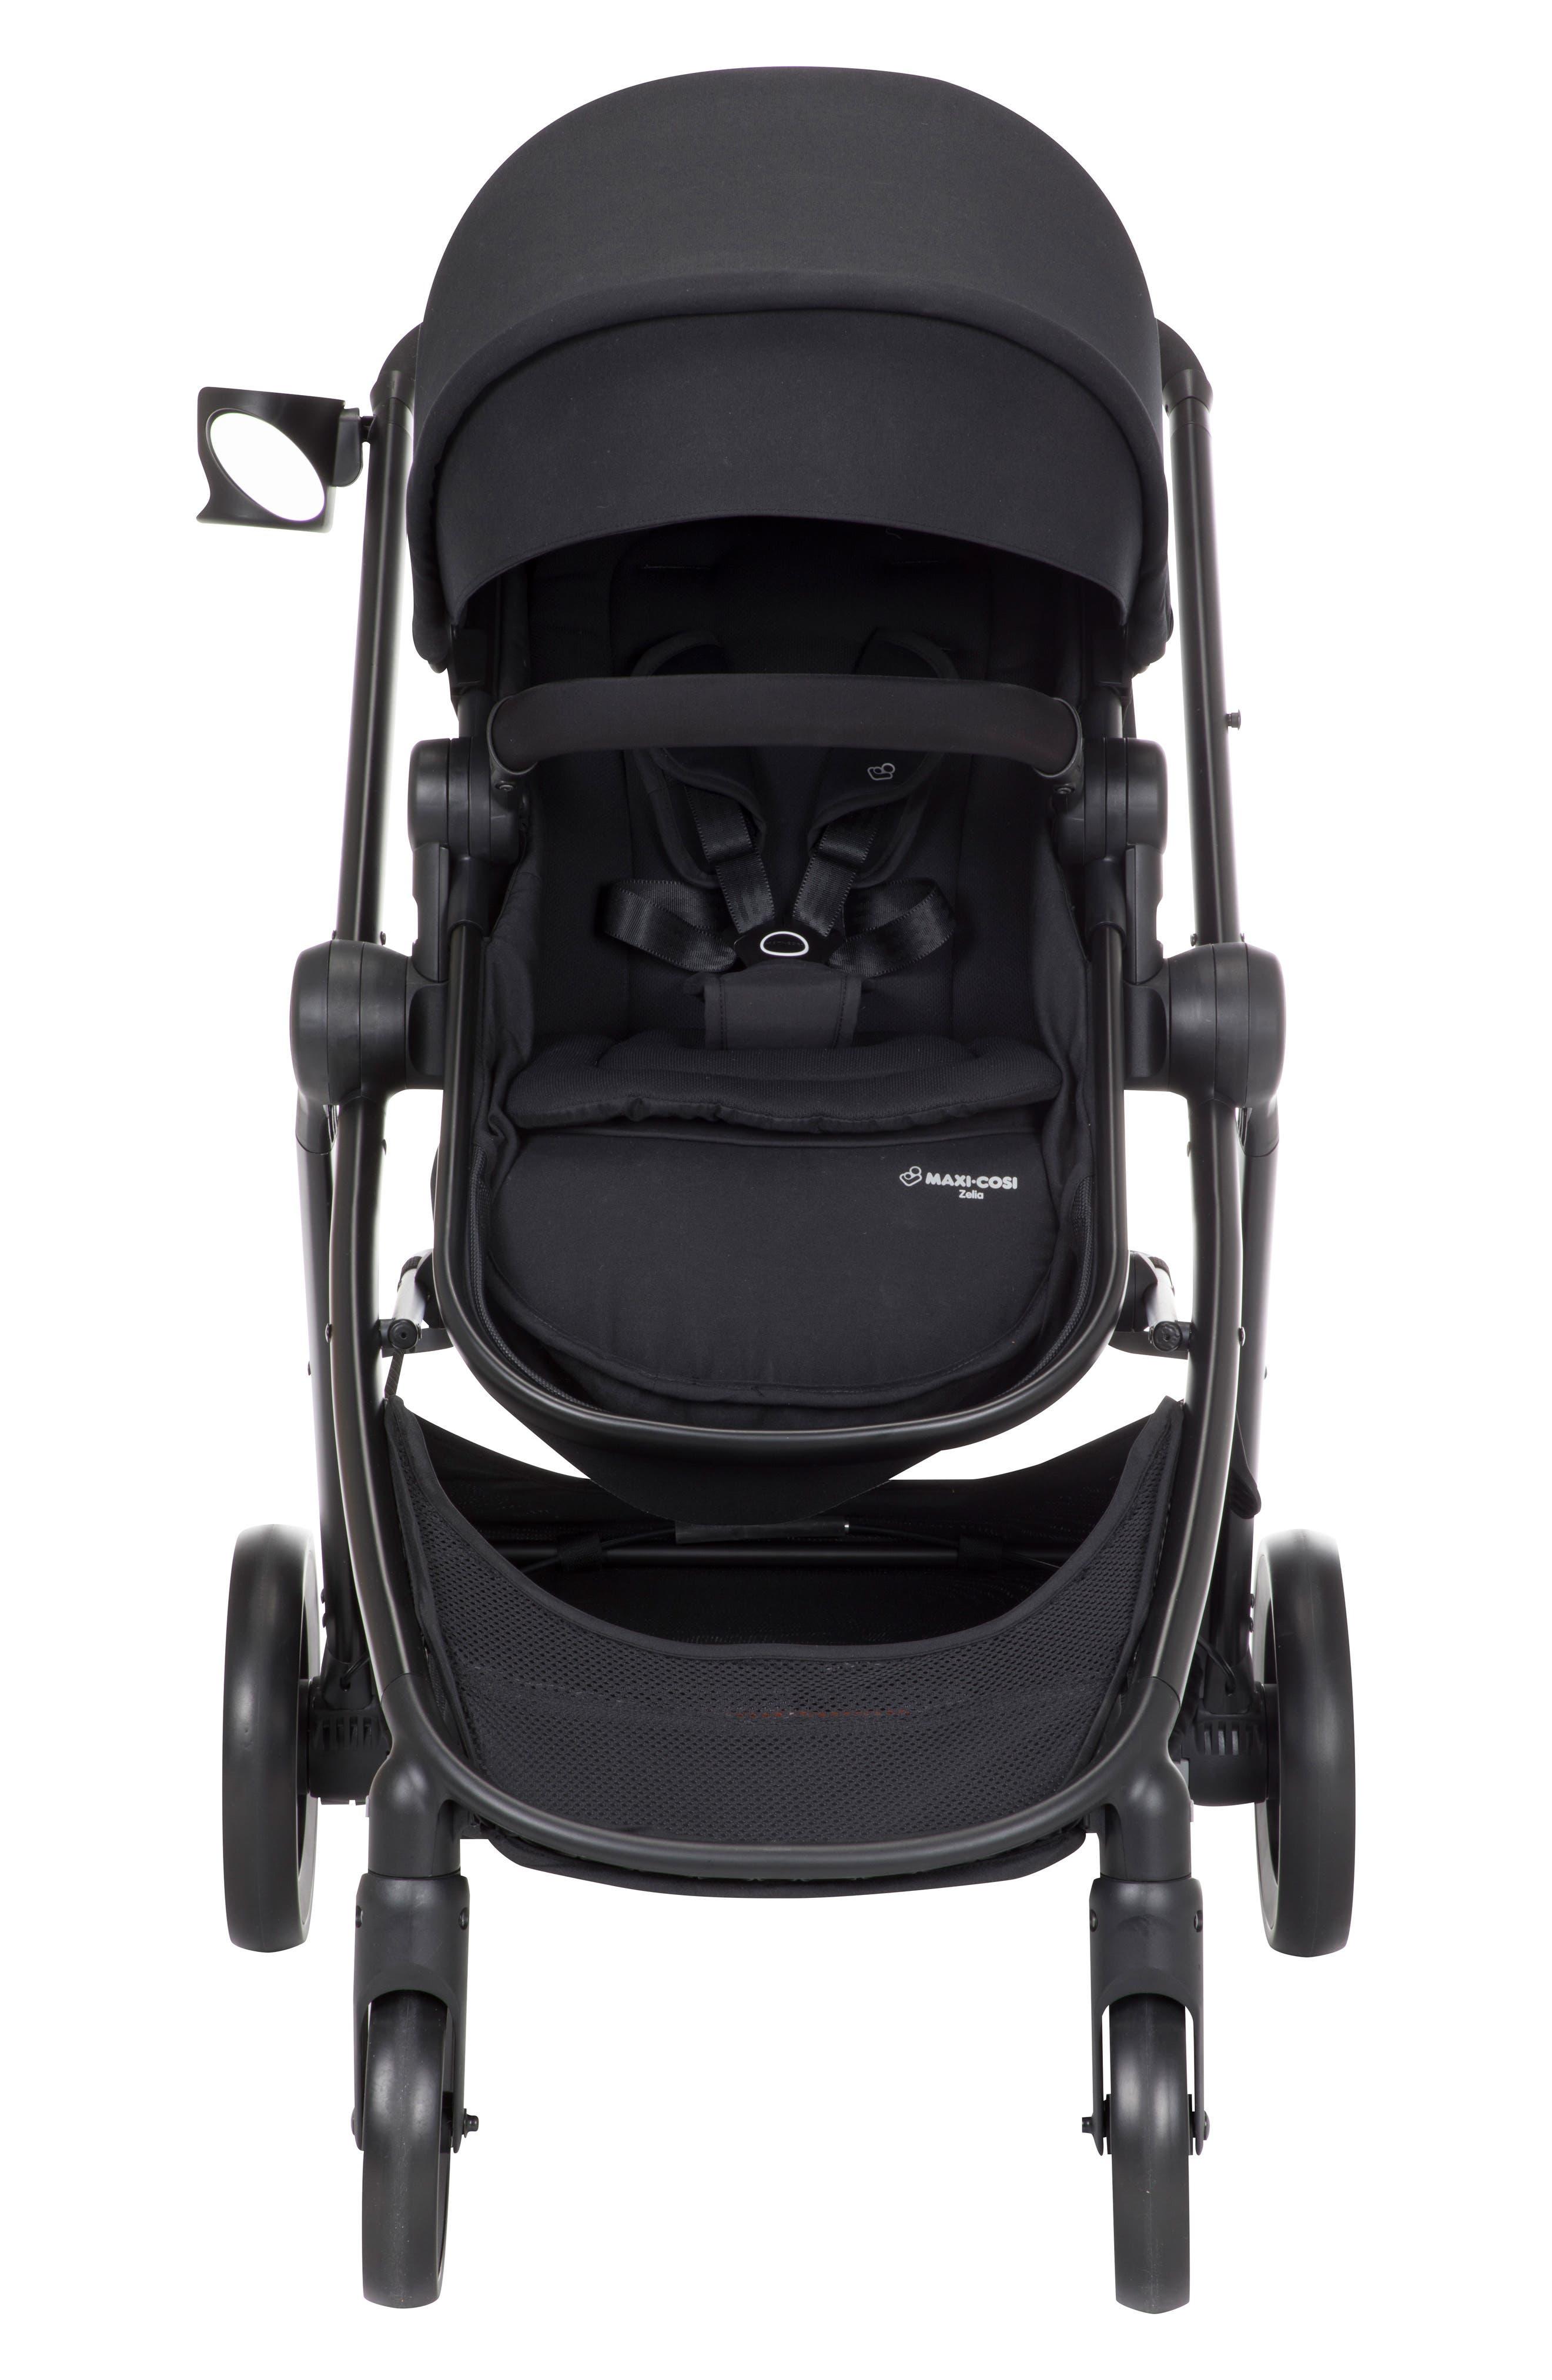 5-1 Mico 30 Infant Car Seat & Zelia Stroller Modular Travel System,                             Main thumbnail 1, color,                             NIGHT BLACK